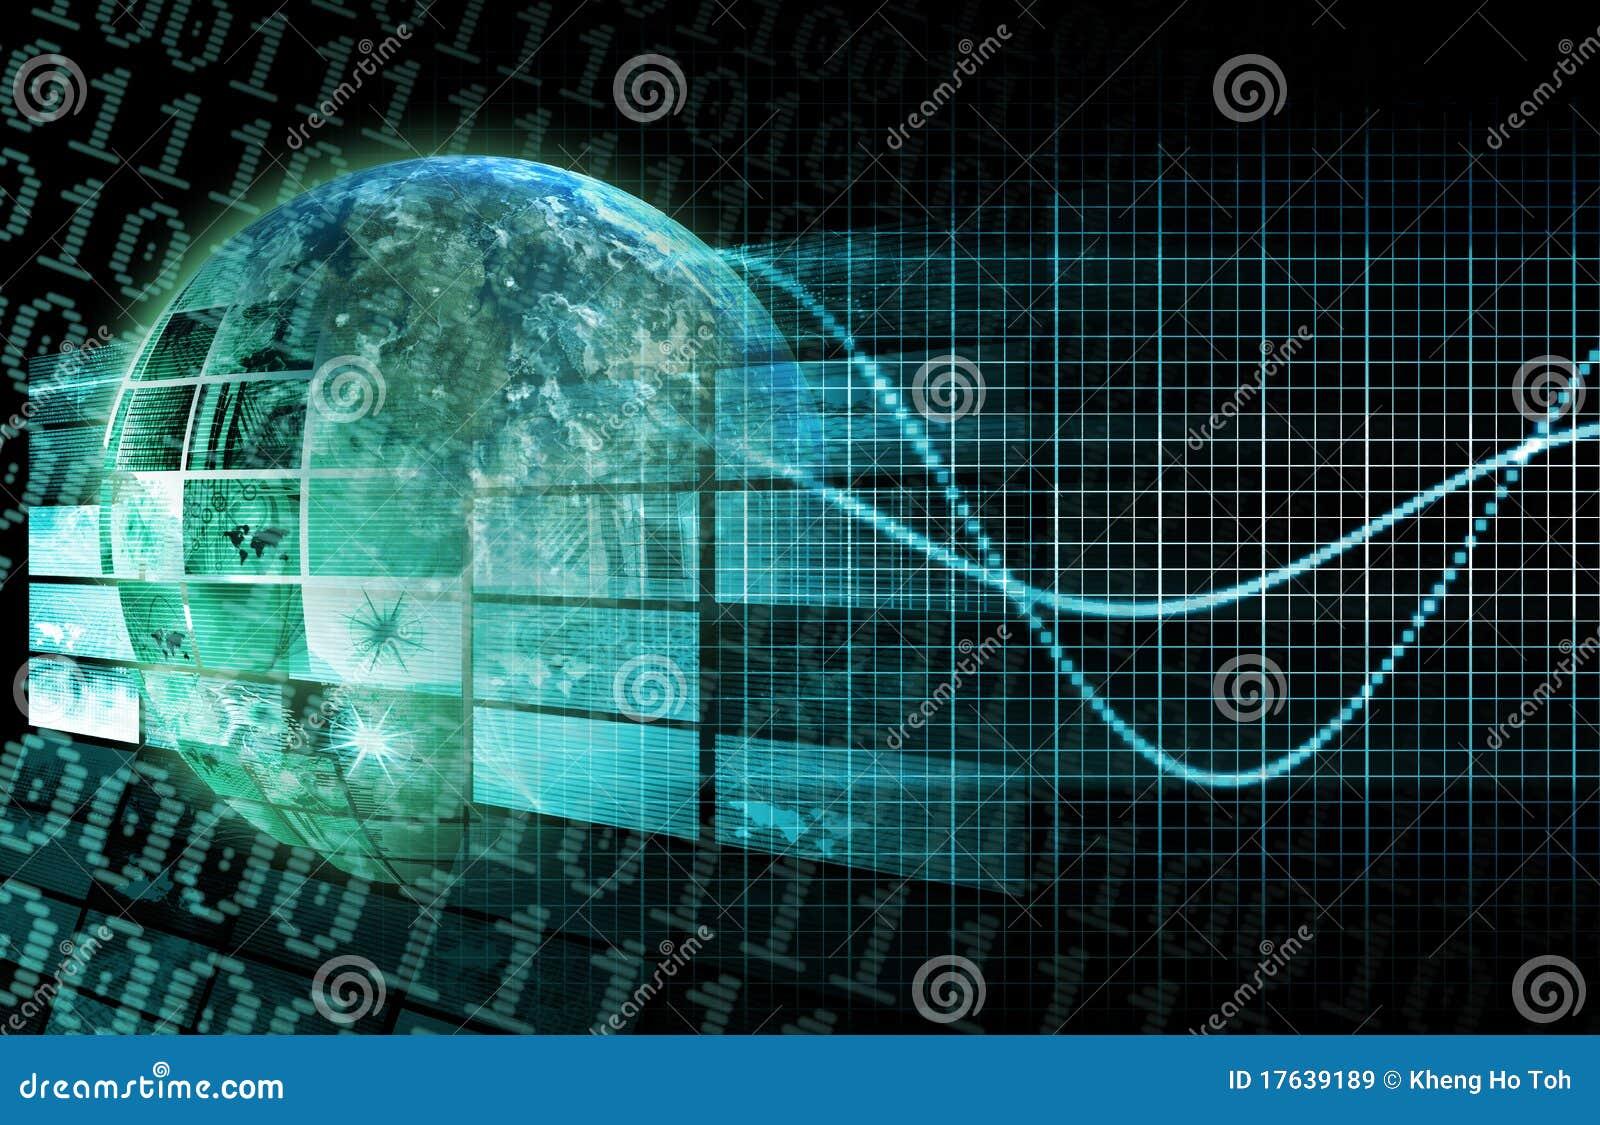 Emerging Technologies Stock Illustration Image Of